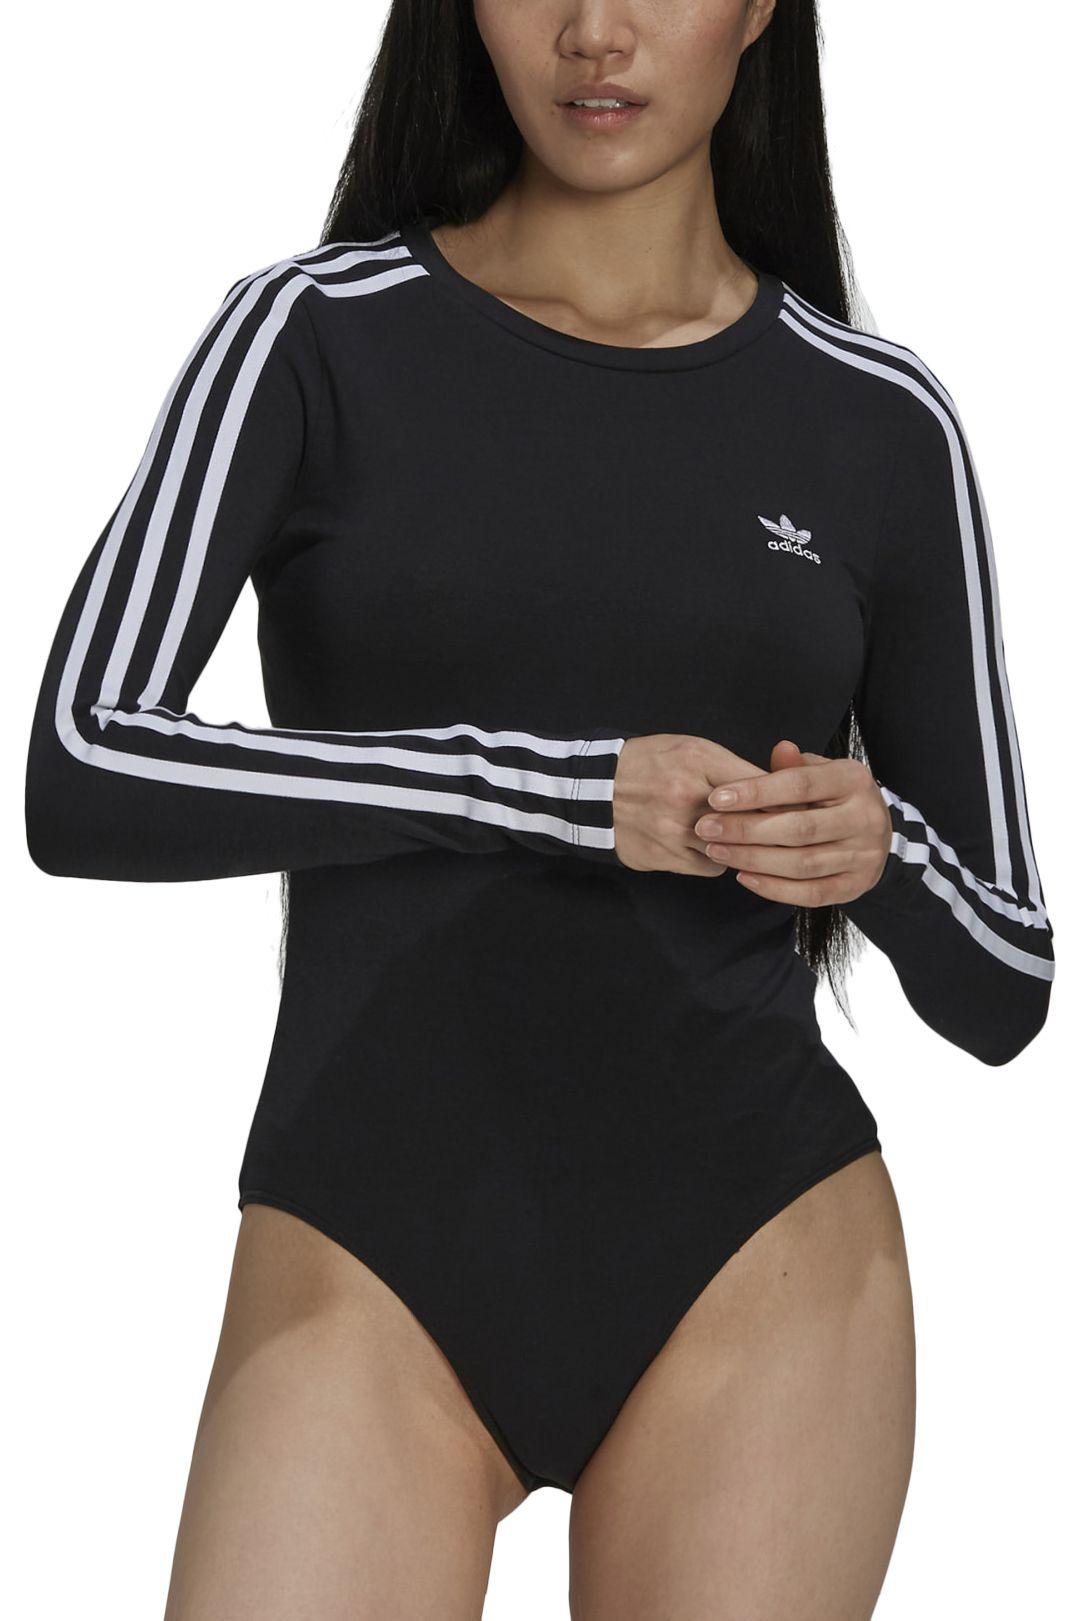 Adidas Top BODY SUIT Black